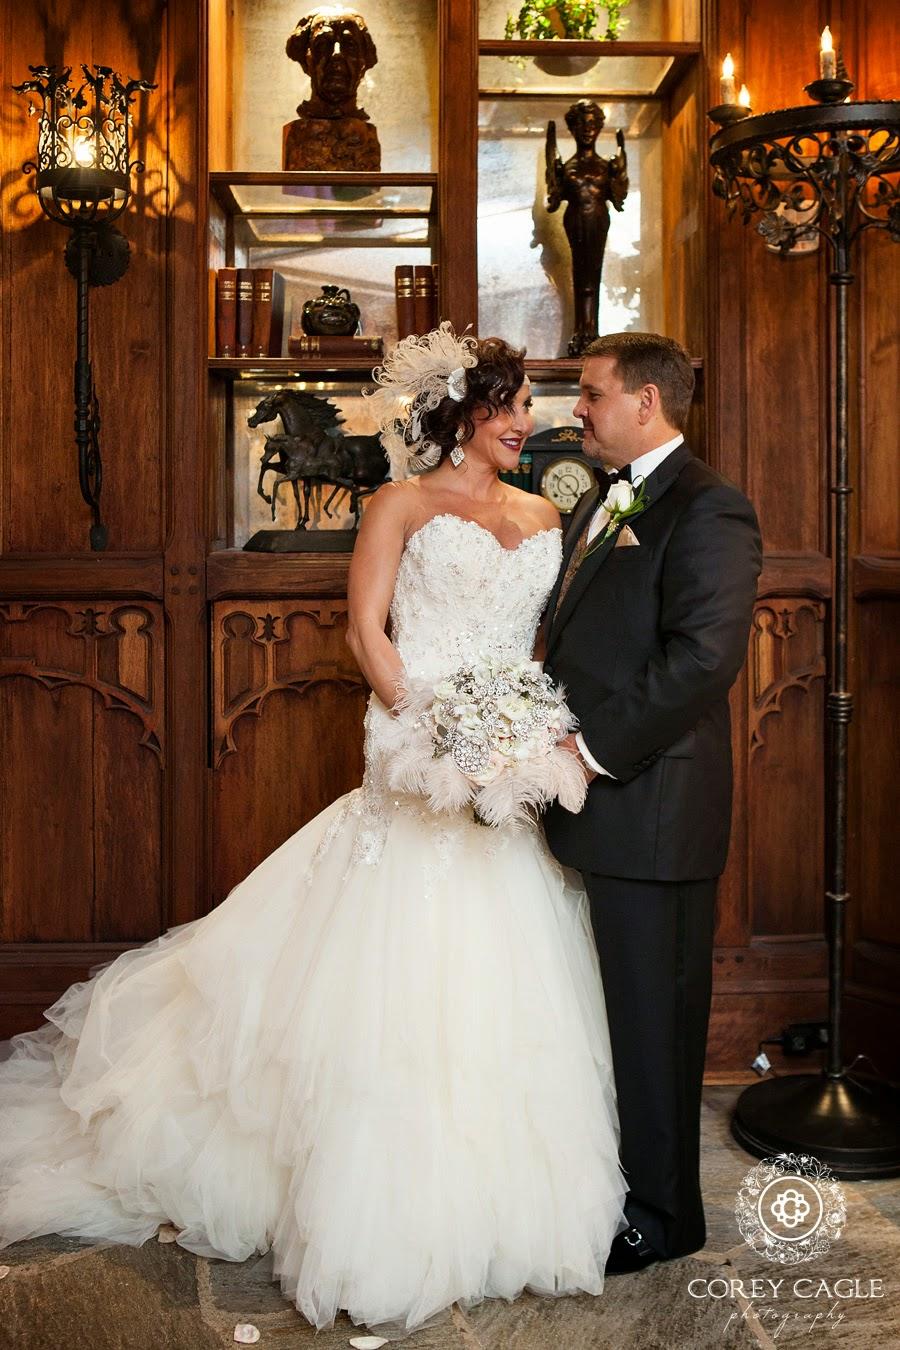 Corey Cagle Photography Wedding Photographer Portrait